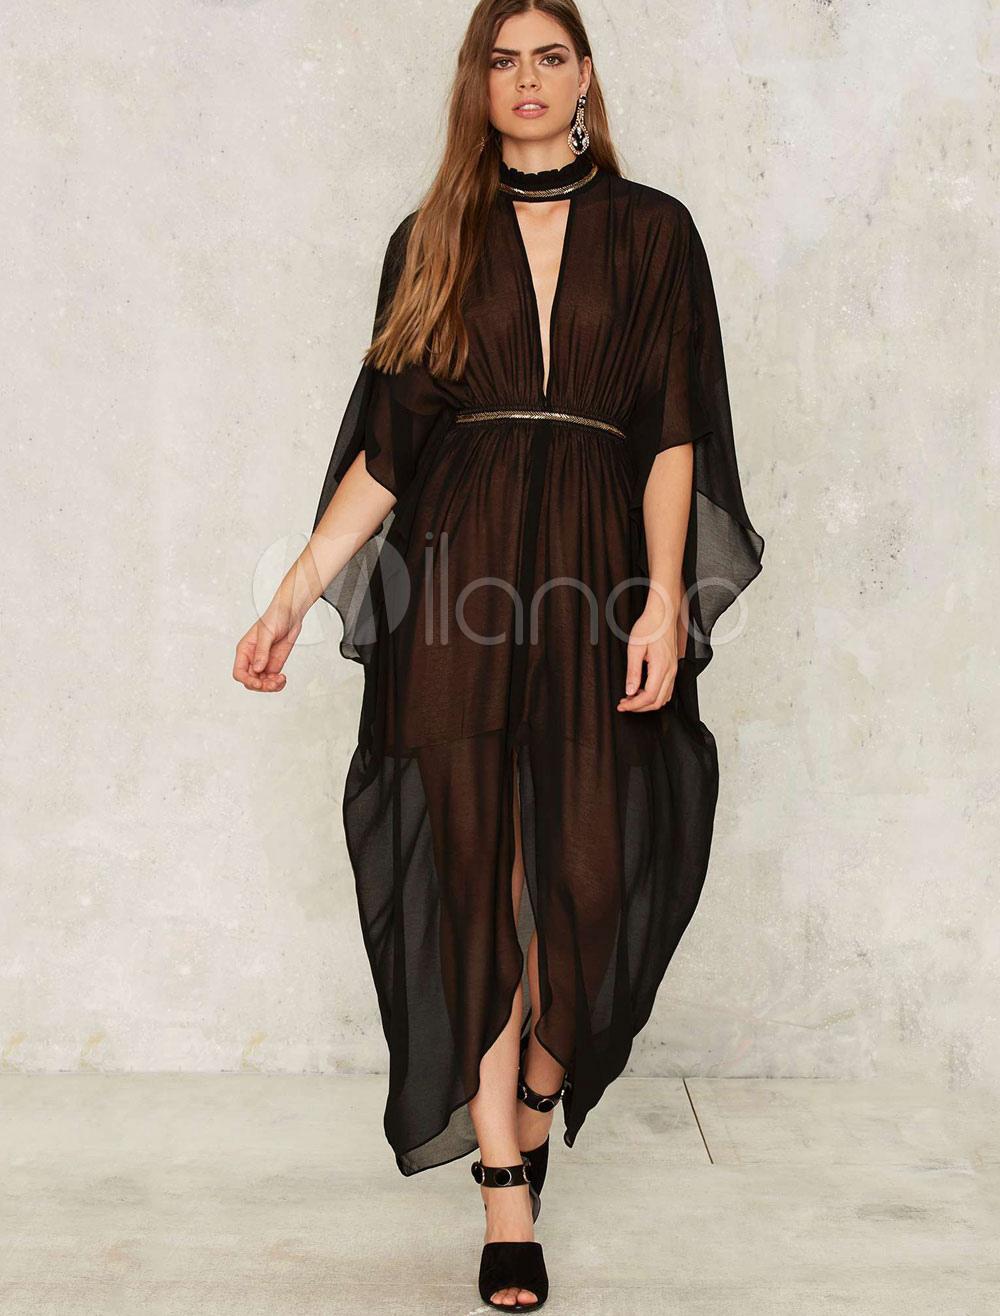 Black Maxi Dress Metallic High Collar Butterfly Sleeve Cut Out Draped Semi Sheer Slit Chic Long Dress (Women\\'s Clothing Maxi Dresses) photo